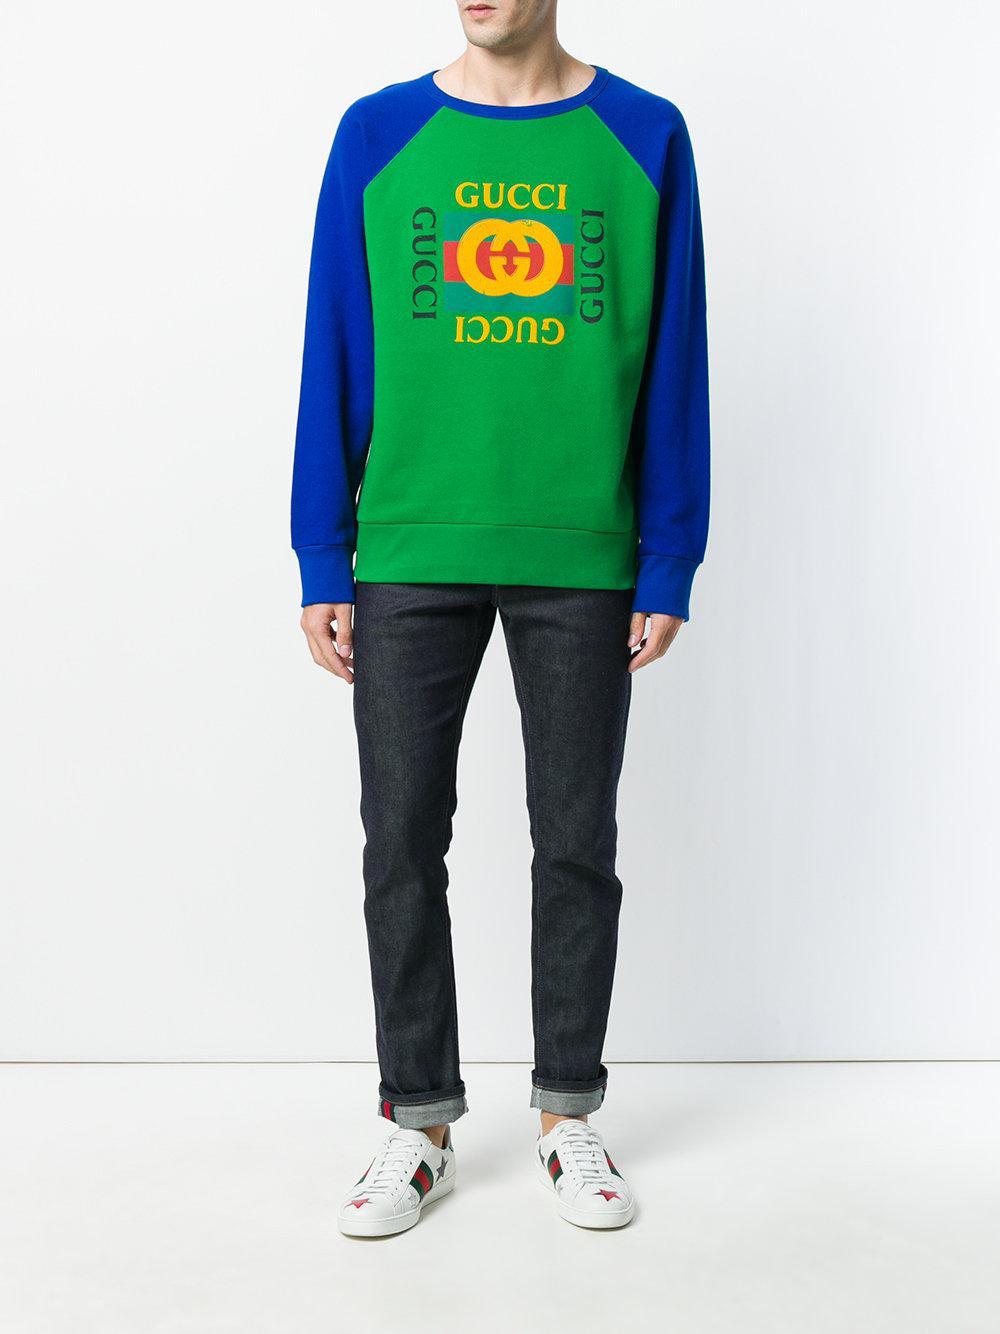 09ea1d5fba3 Gucci Print Sweatshirt in Green for Men - Save 42% - Lyst